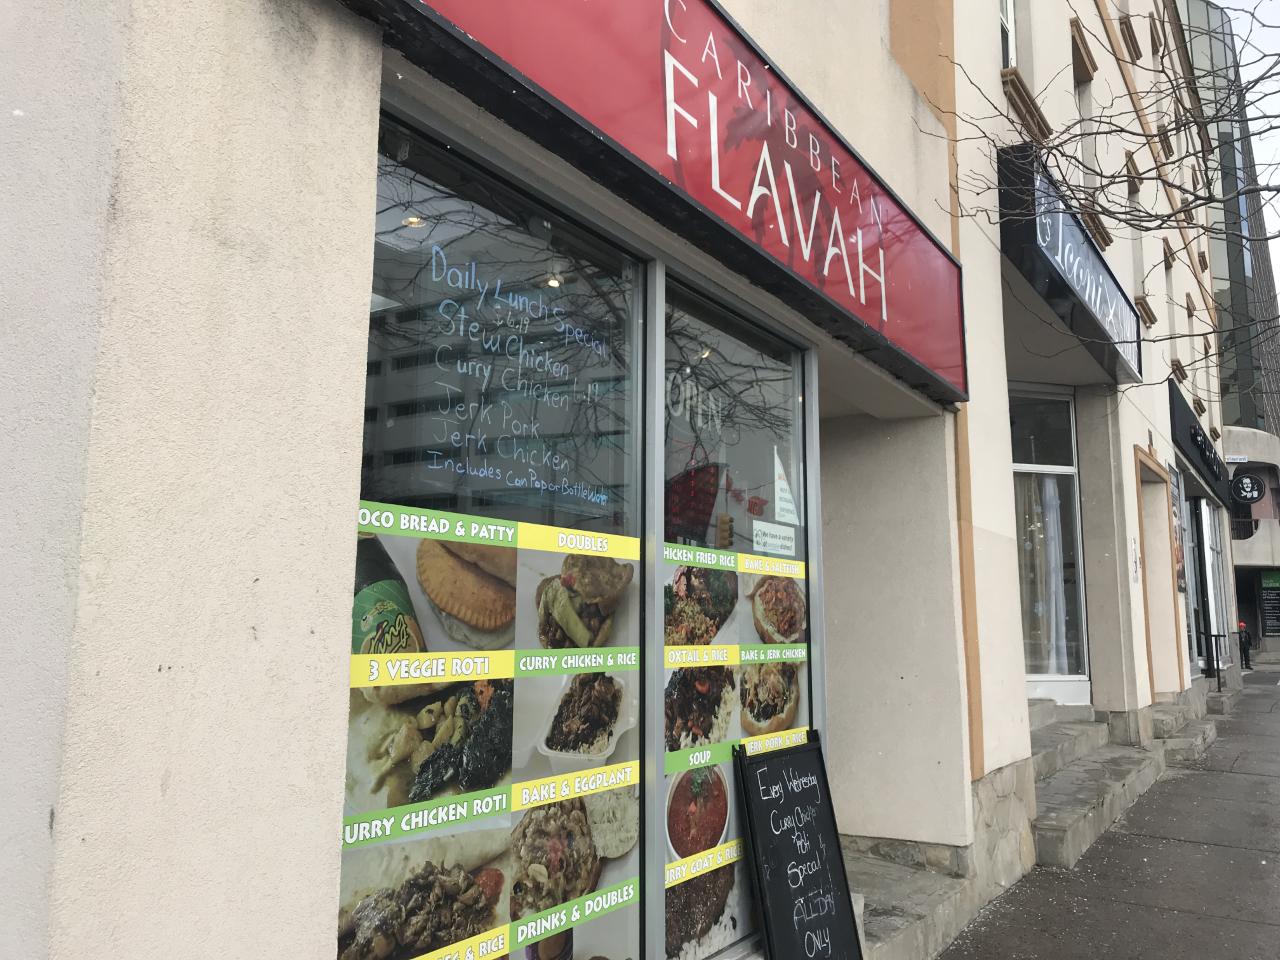 Outside Caribben Flavah restaurant